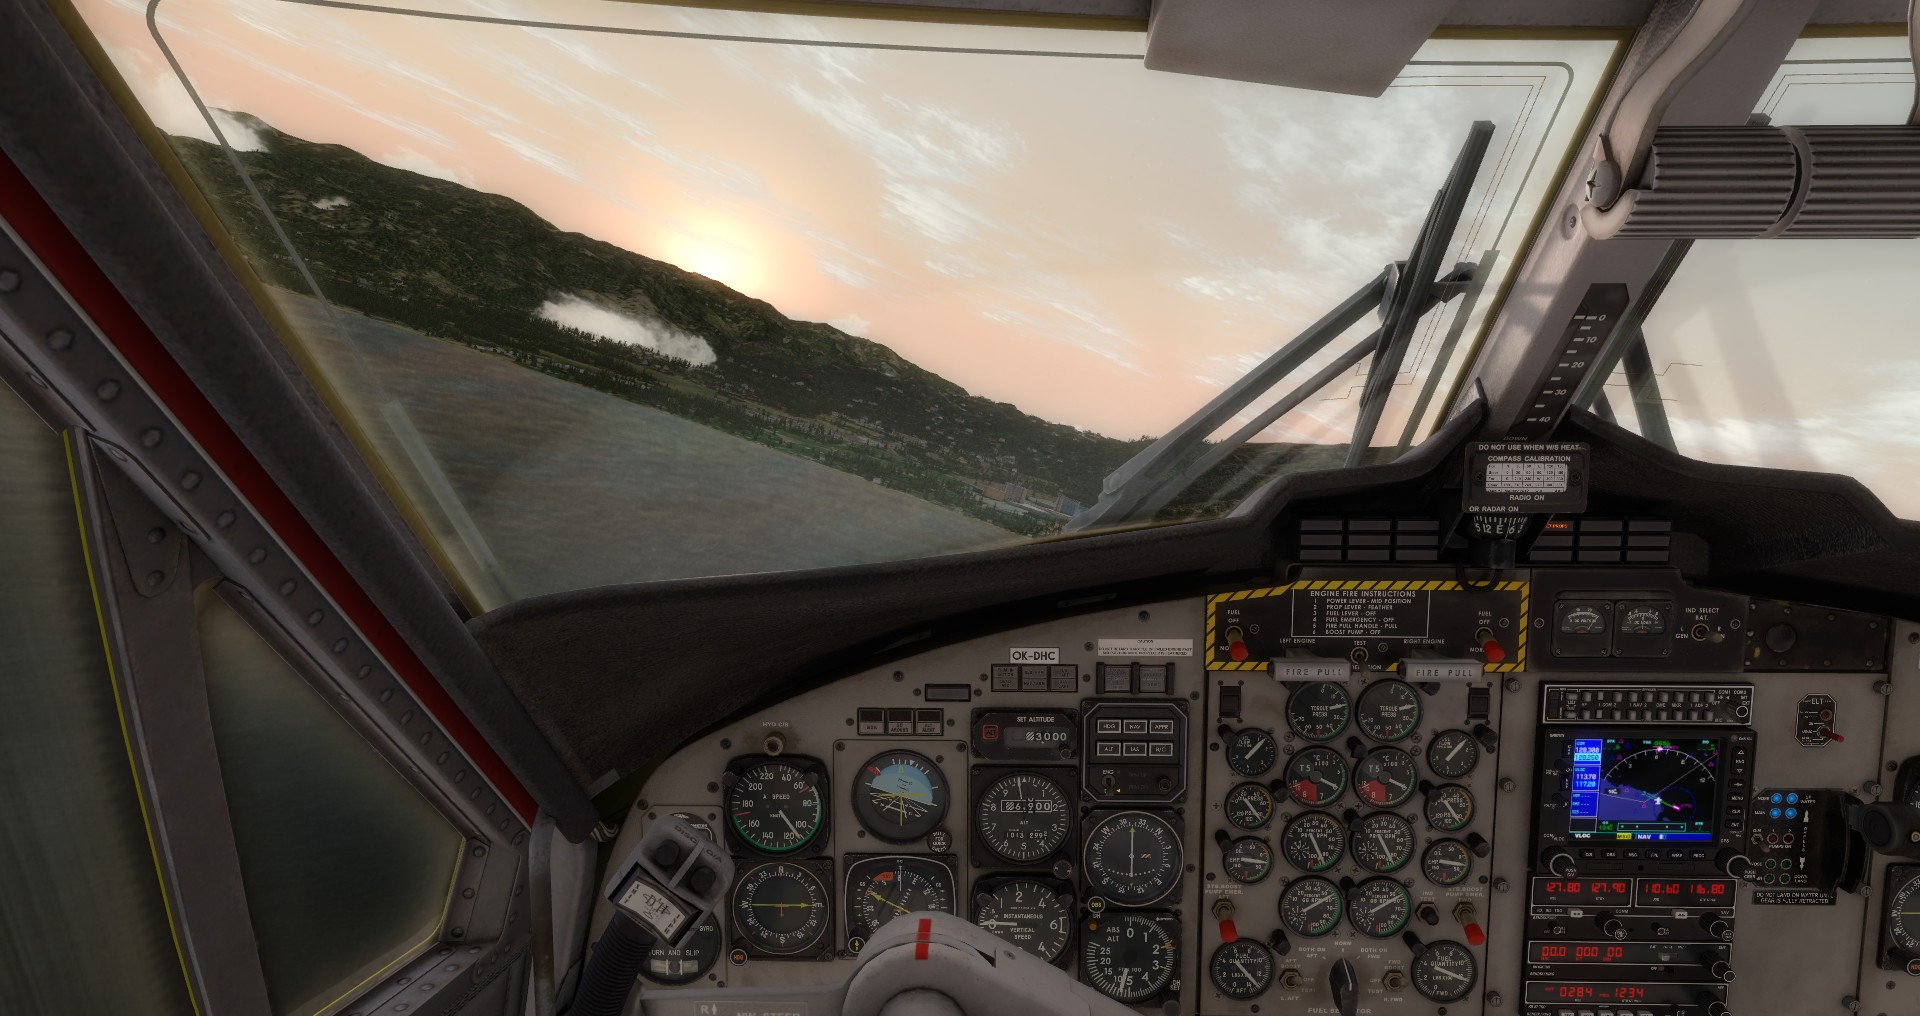 VFD Čelákovice DHC-6 Twin Otter - cockpit (just registration plate updated)